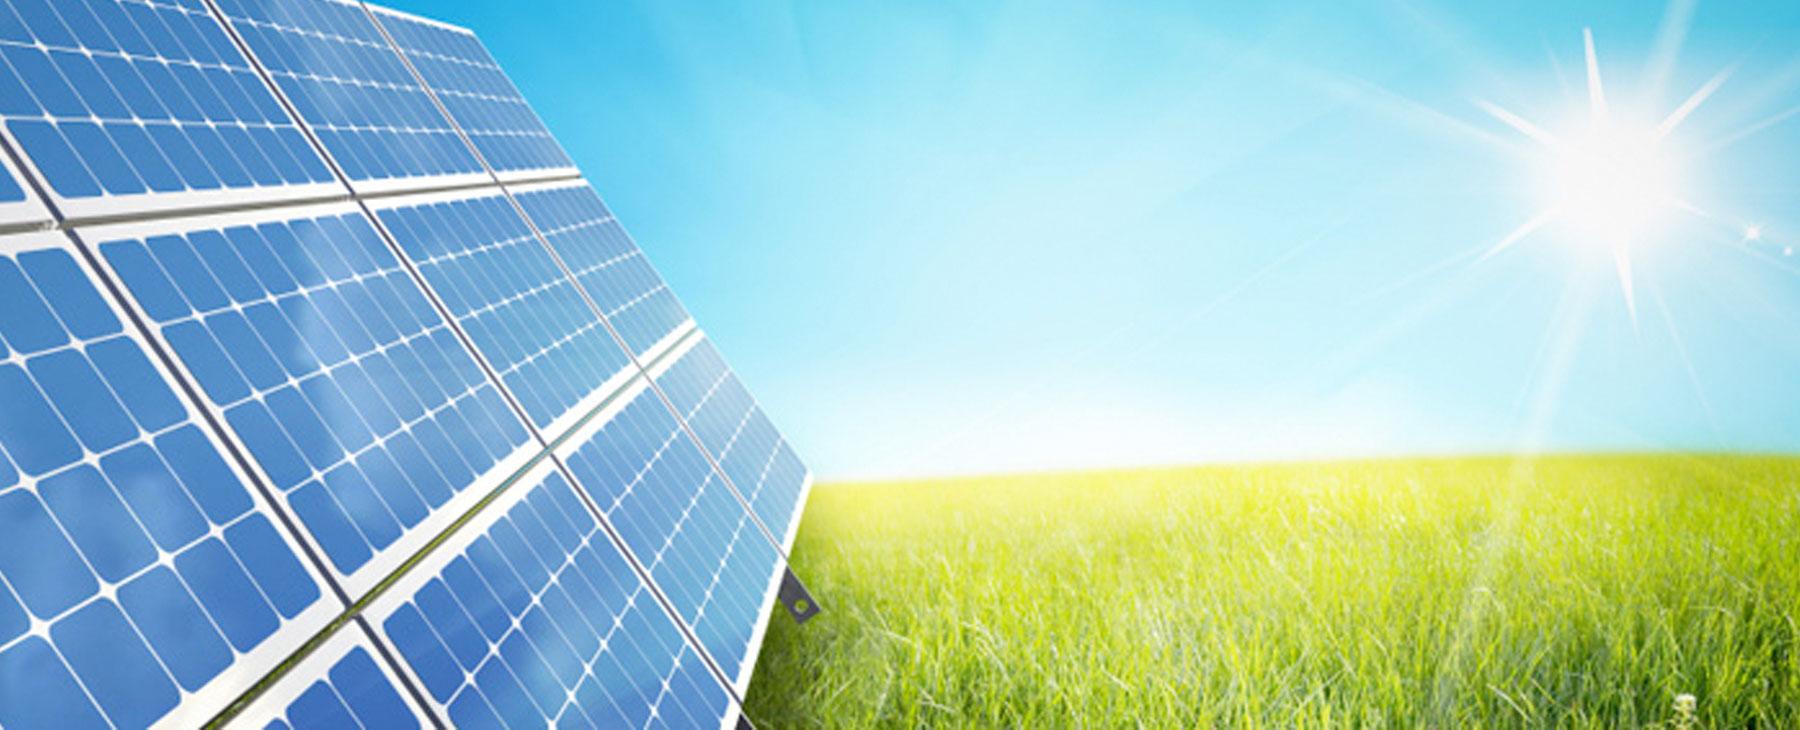 Sai Office - Solar